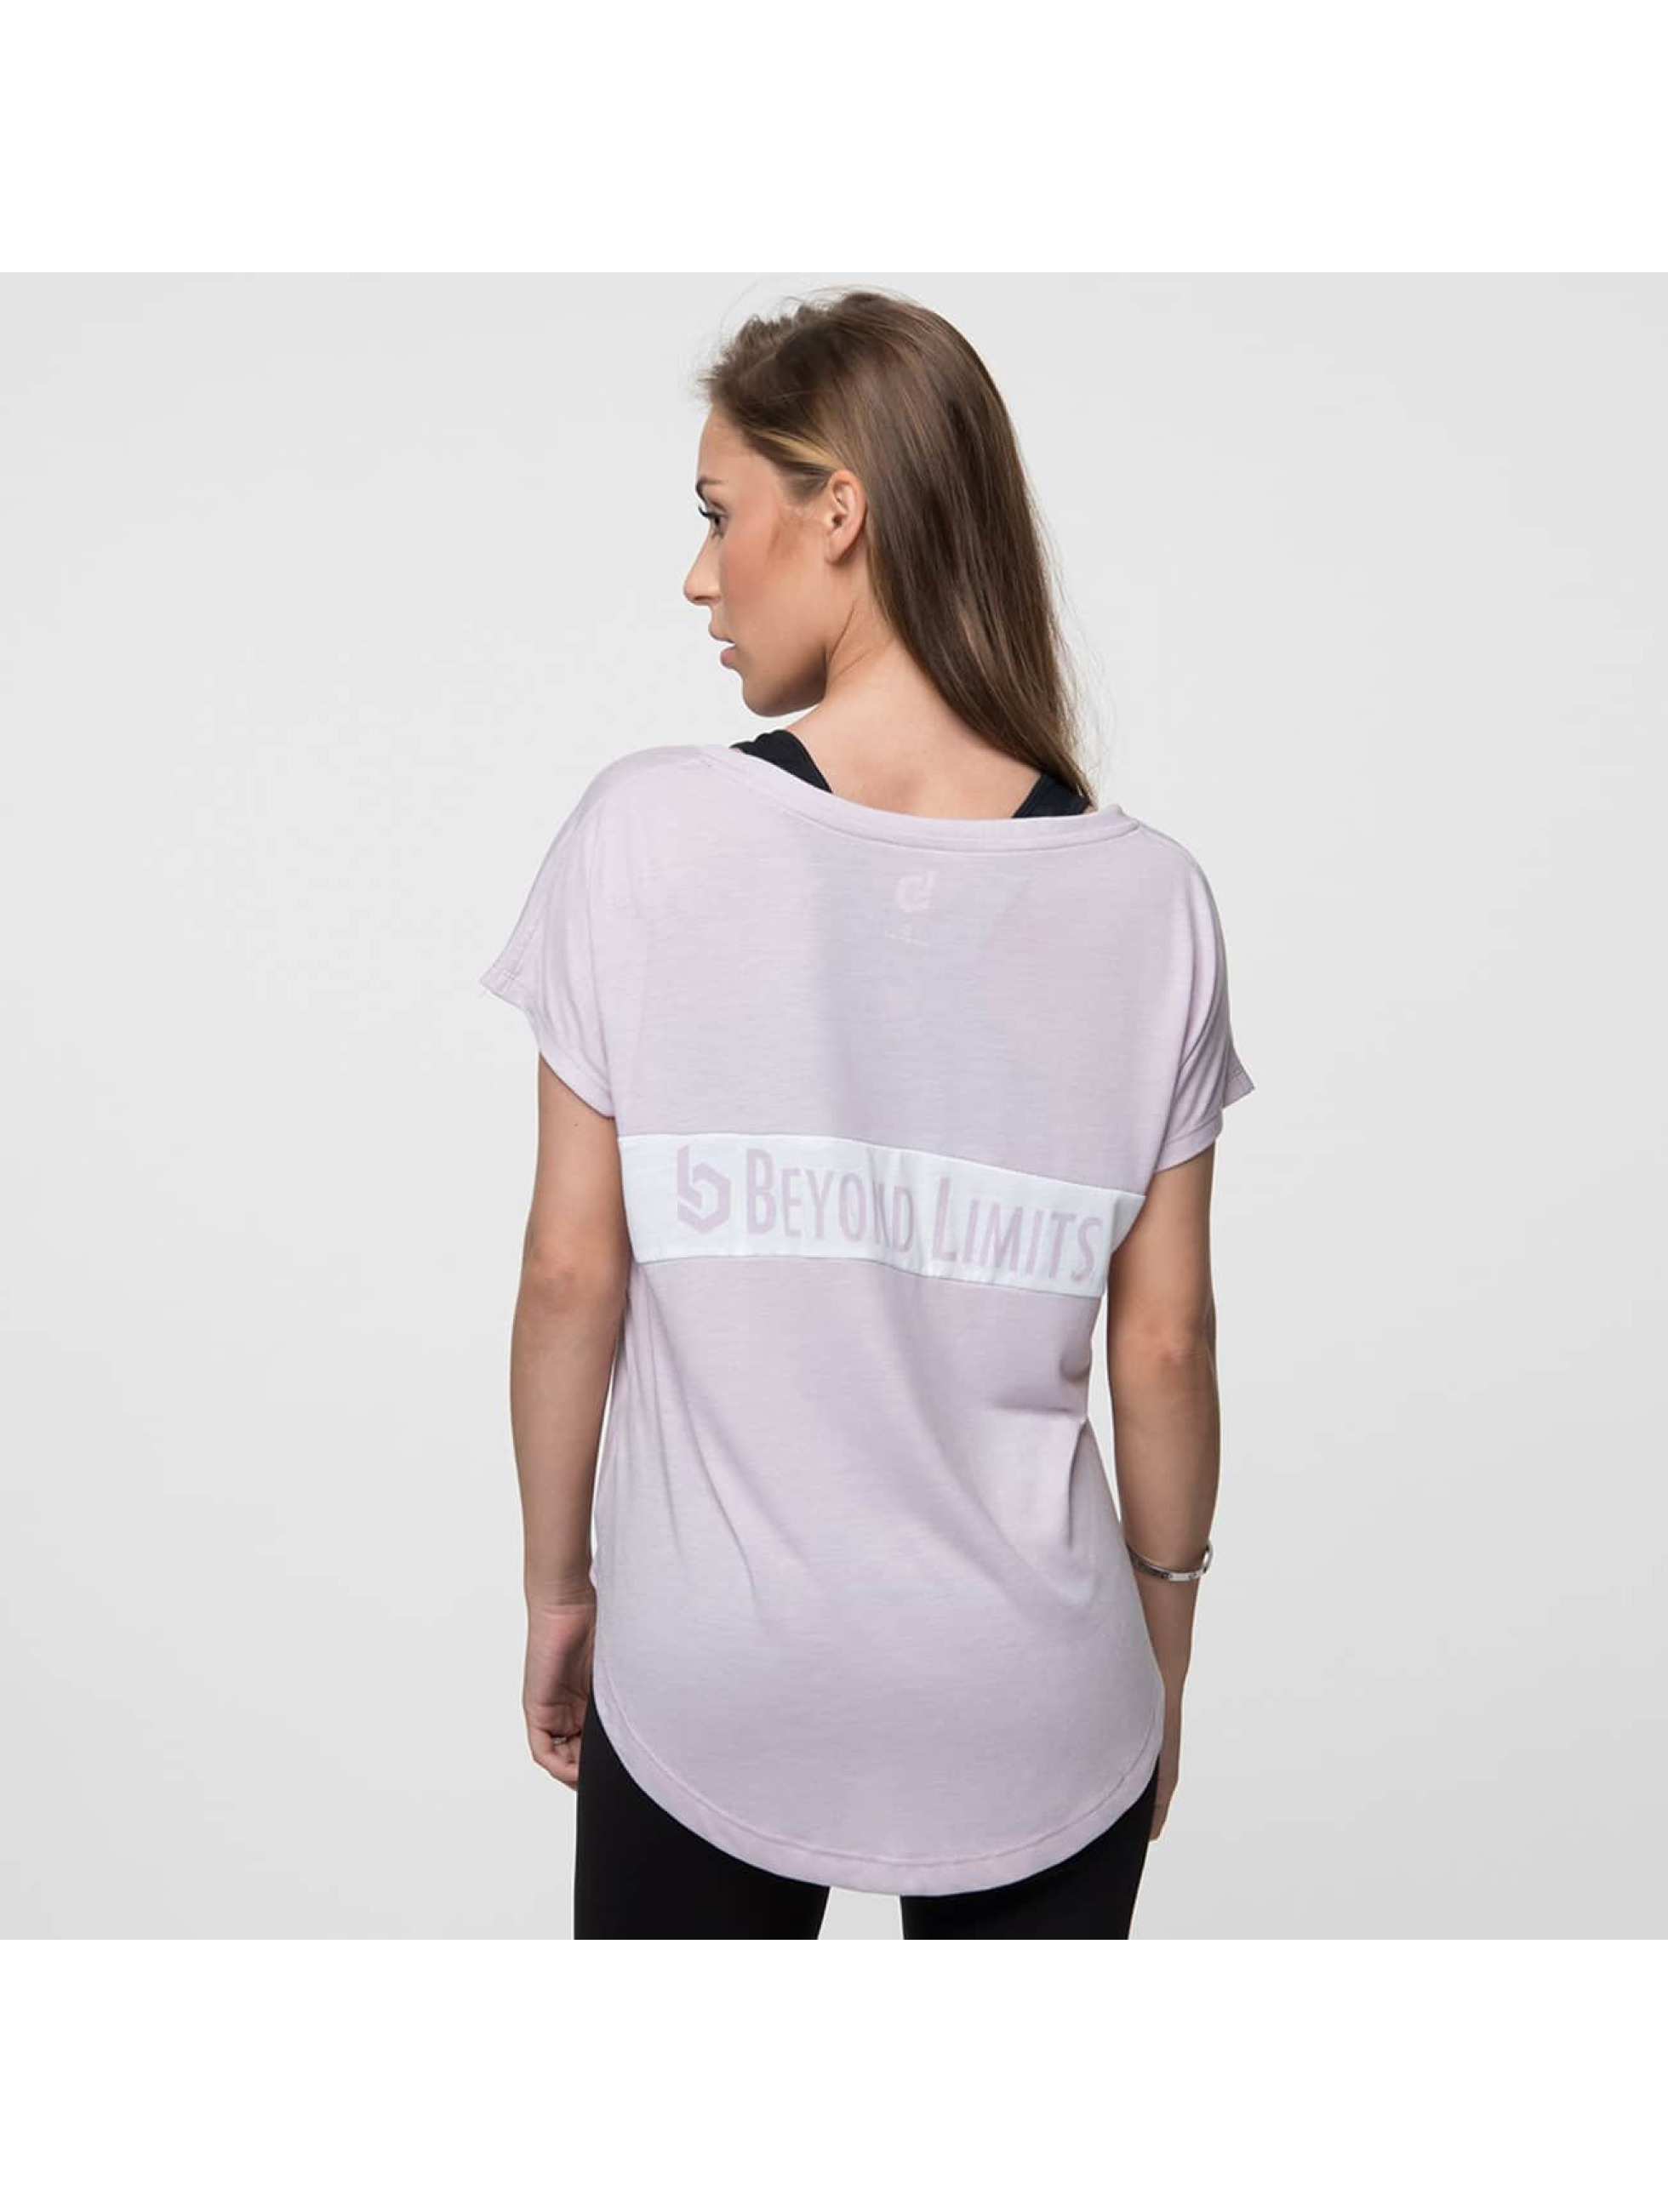 Beyond Limits Camiseta Casual rosa